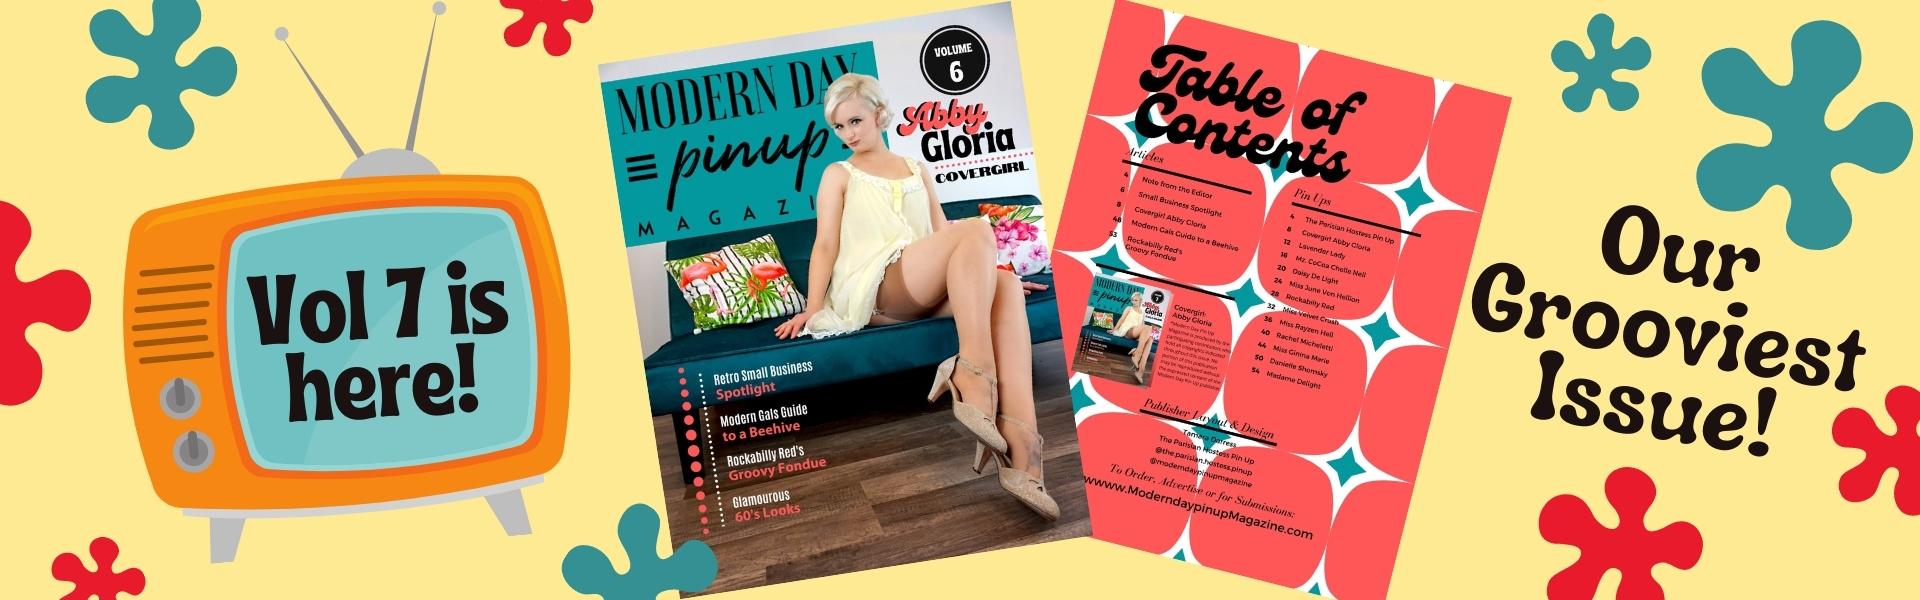 Modern Day Pin Up Magazine Volume 6